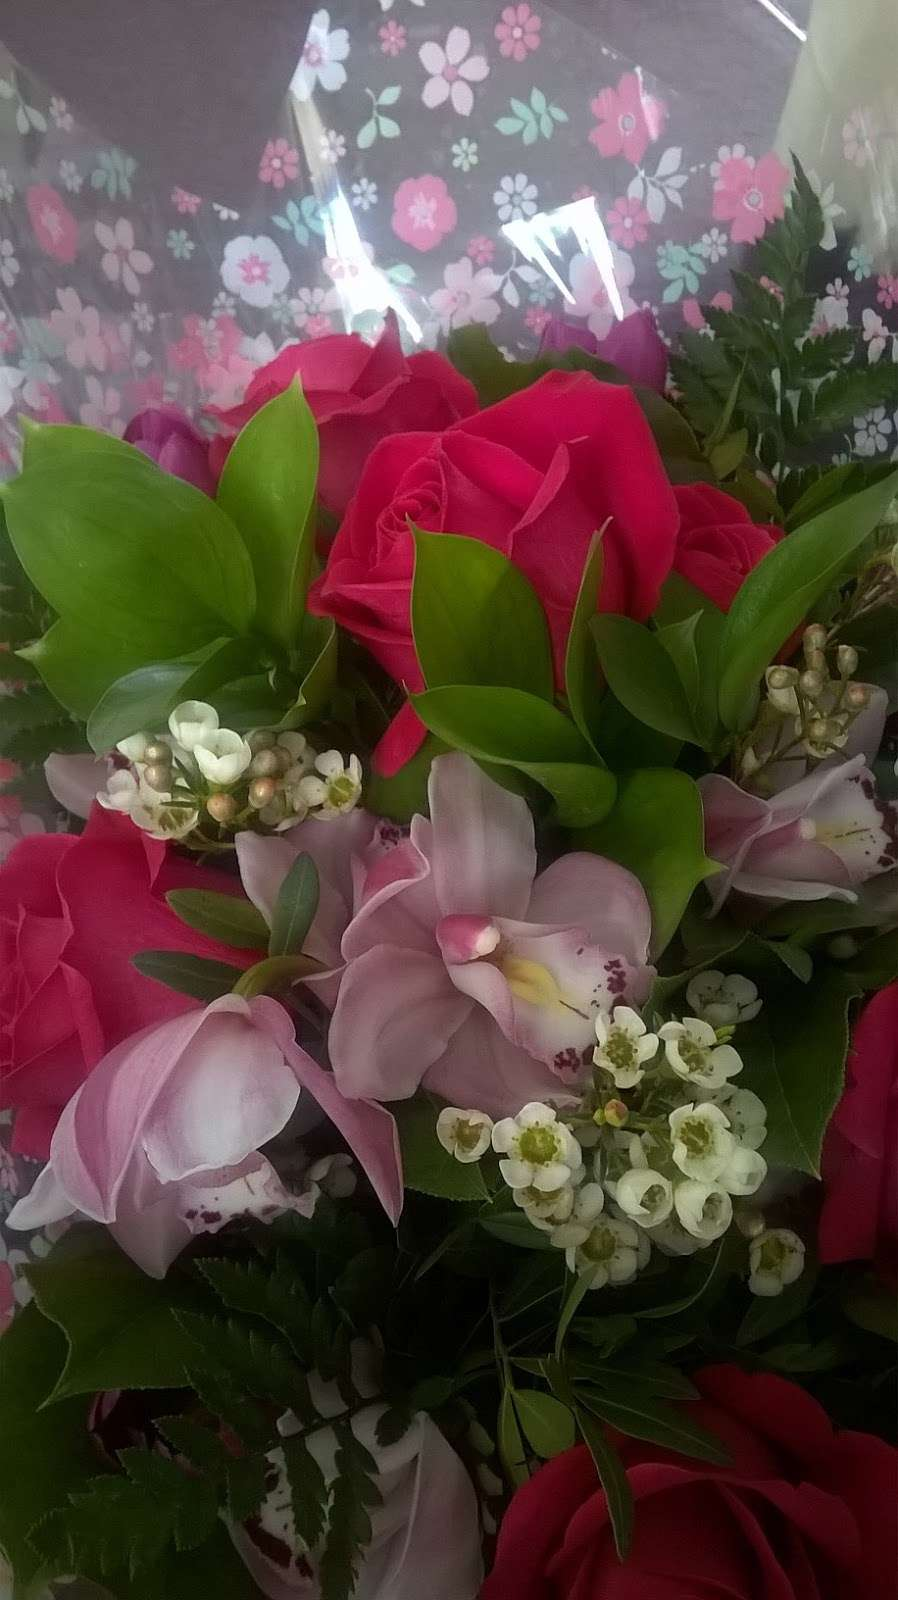 Ashlea Flowers - florist  | Photo 4 of 5 | Address: Ashlea Nursery, Birchwood Rd, Dartford DA2 7HQ, UK | Phone: 01322 666555